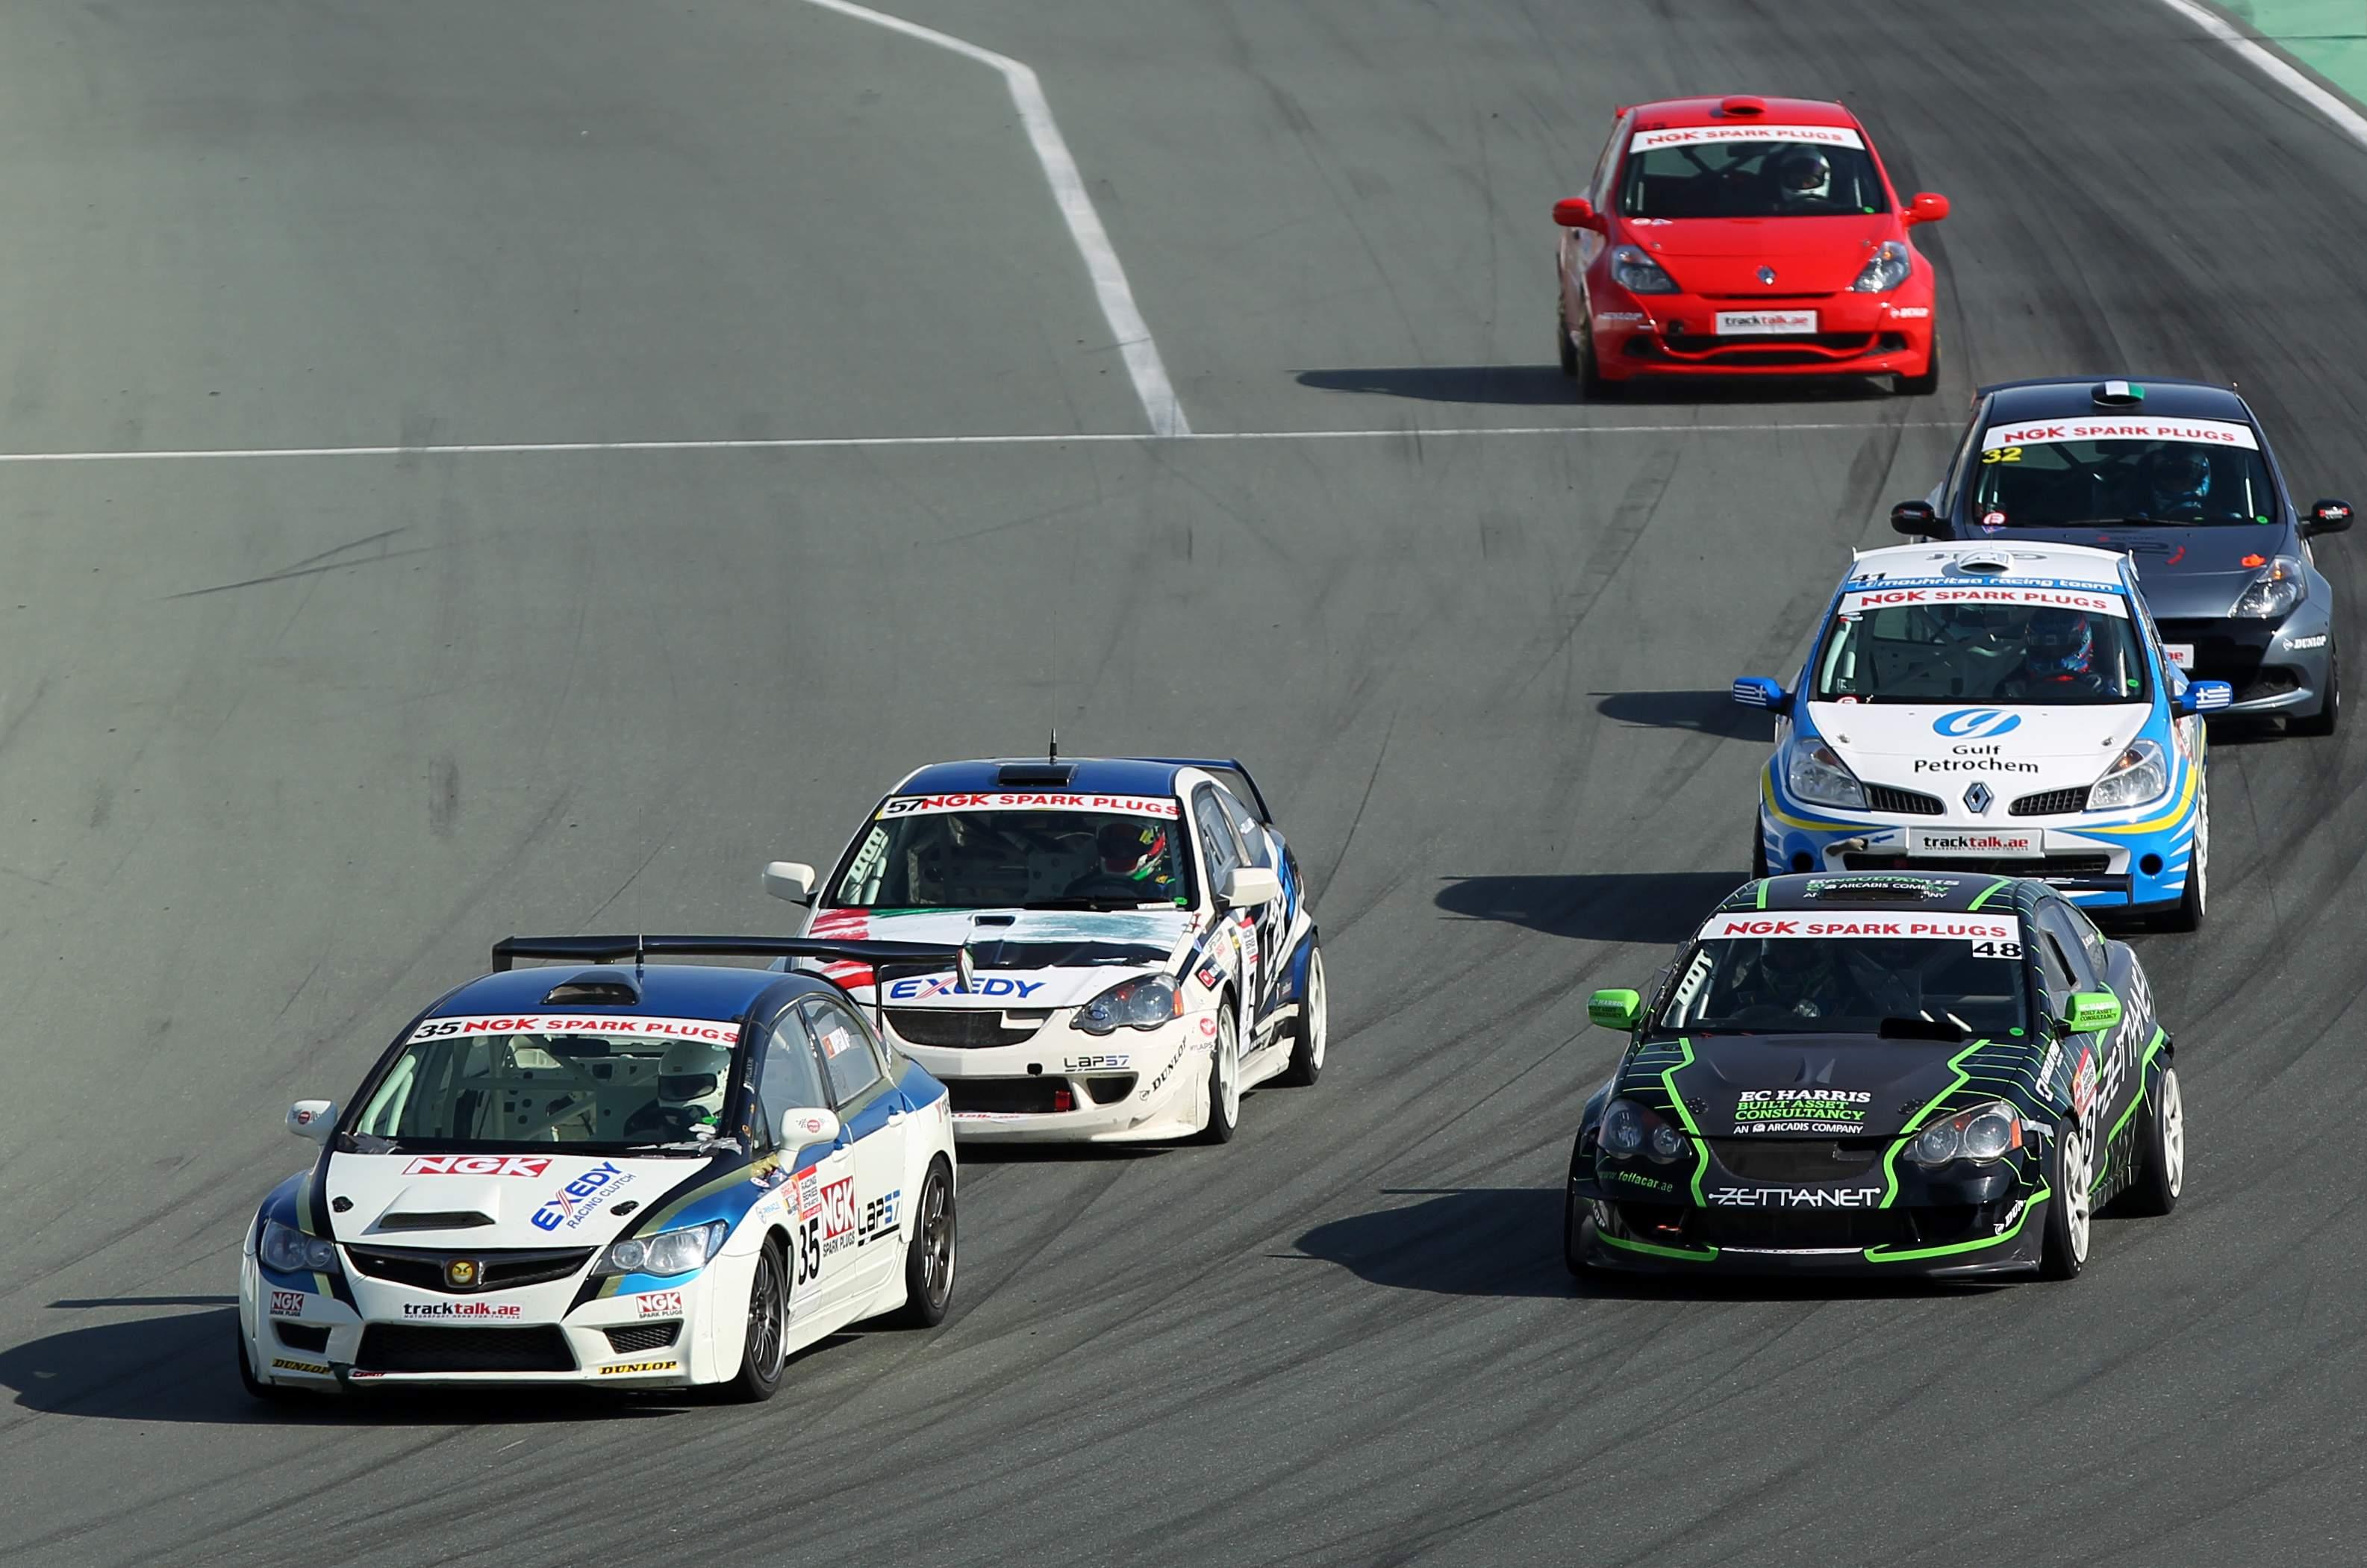 Dubai: Action packed Dubai Motorsport Festival at Autodrome this weekend